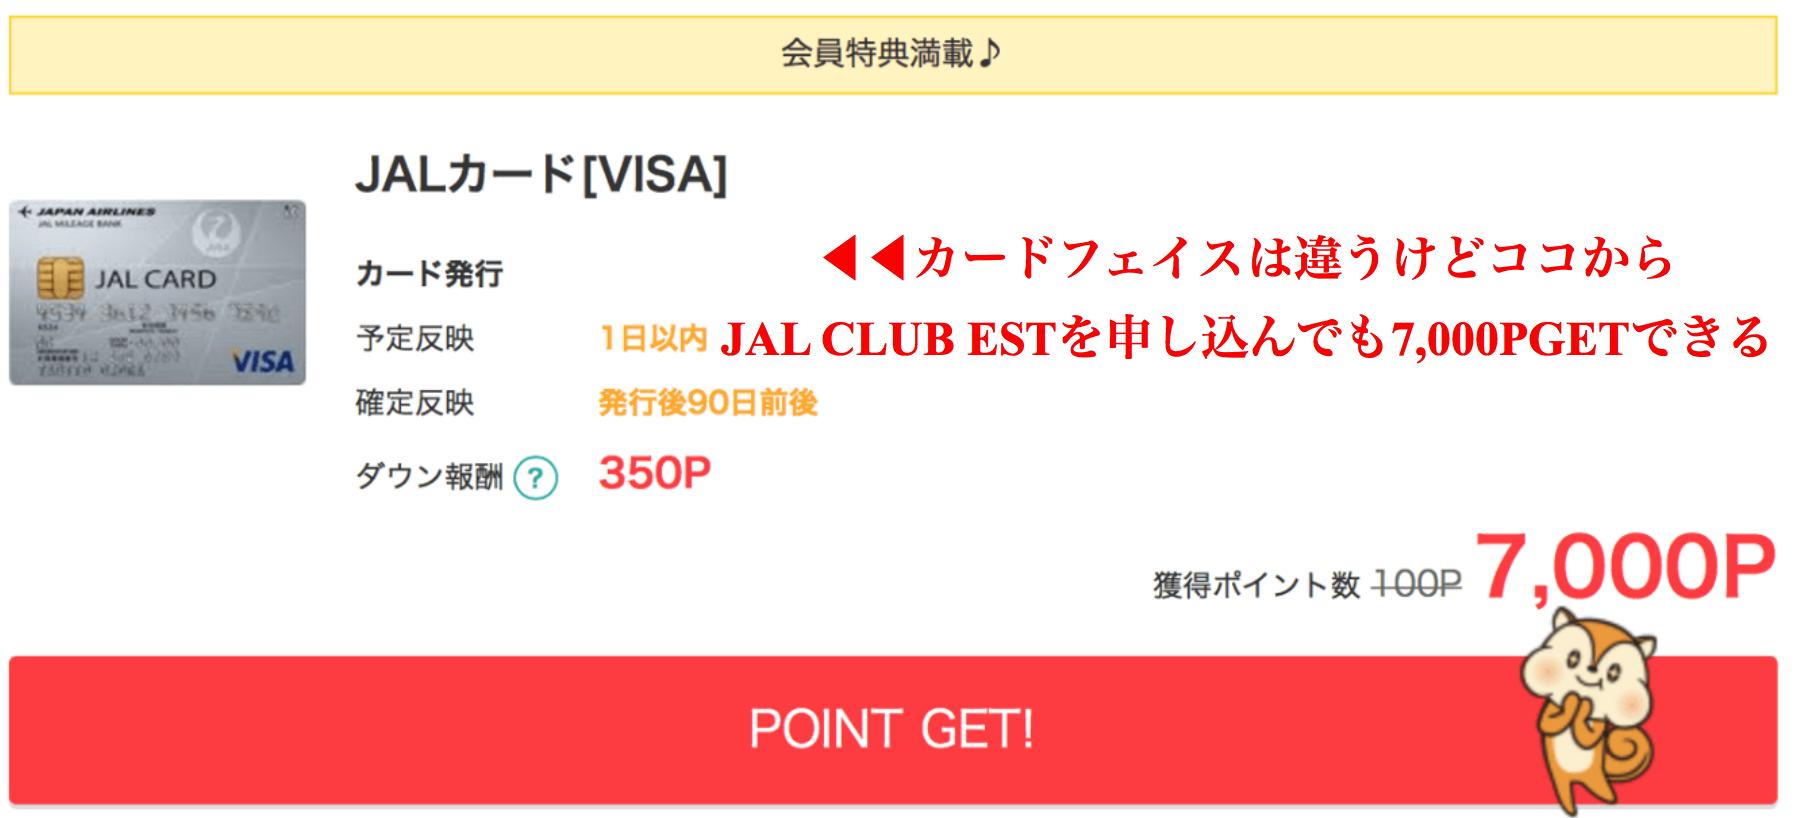 JAL CLUB ESTの年会費分を回収してもお釣りが来る